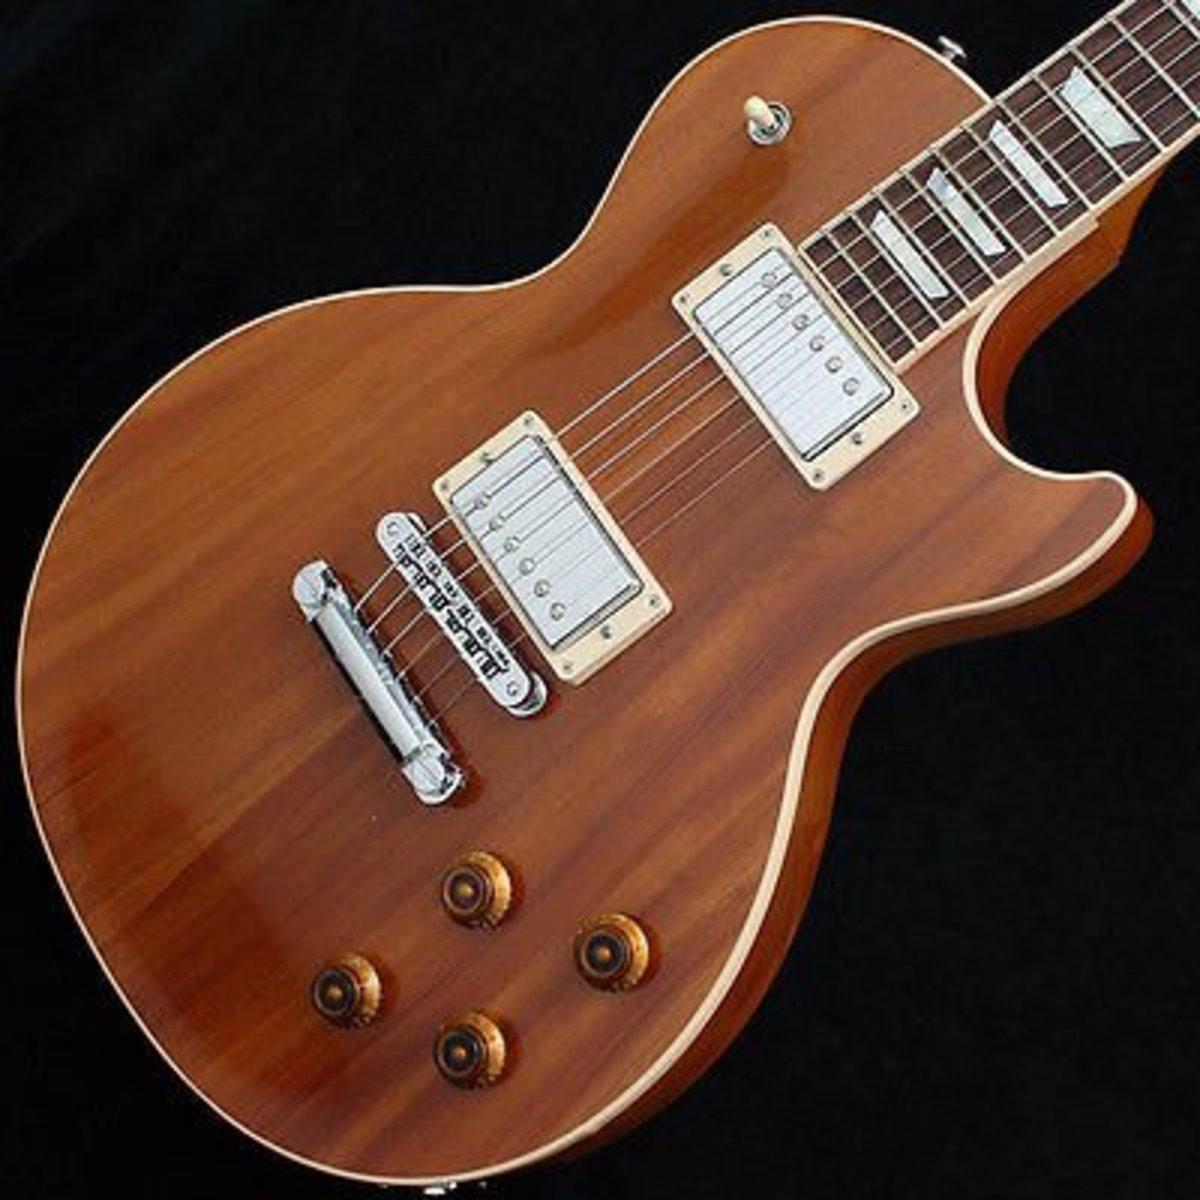 Best Finish For Mahogany Guitar